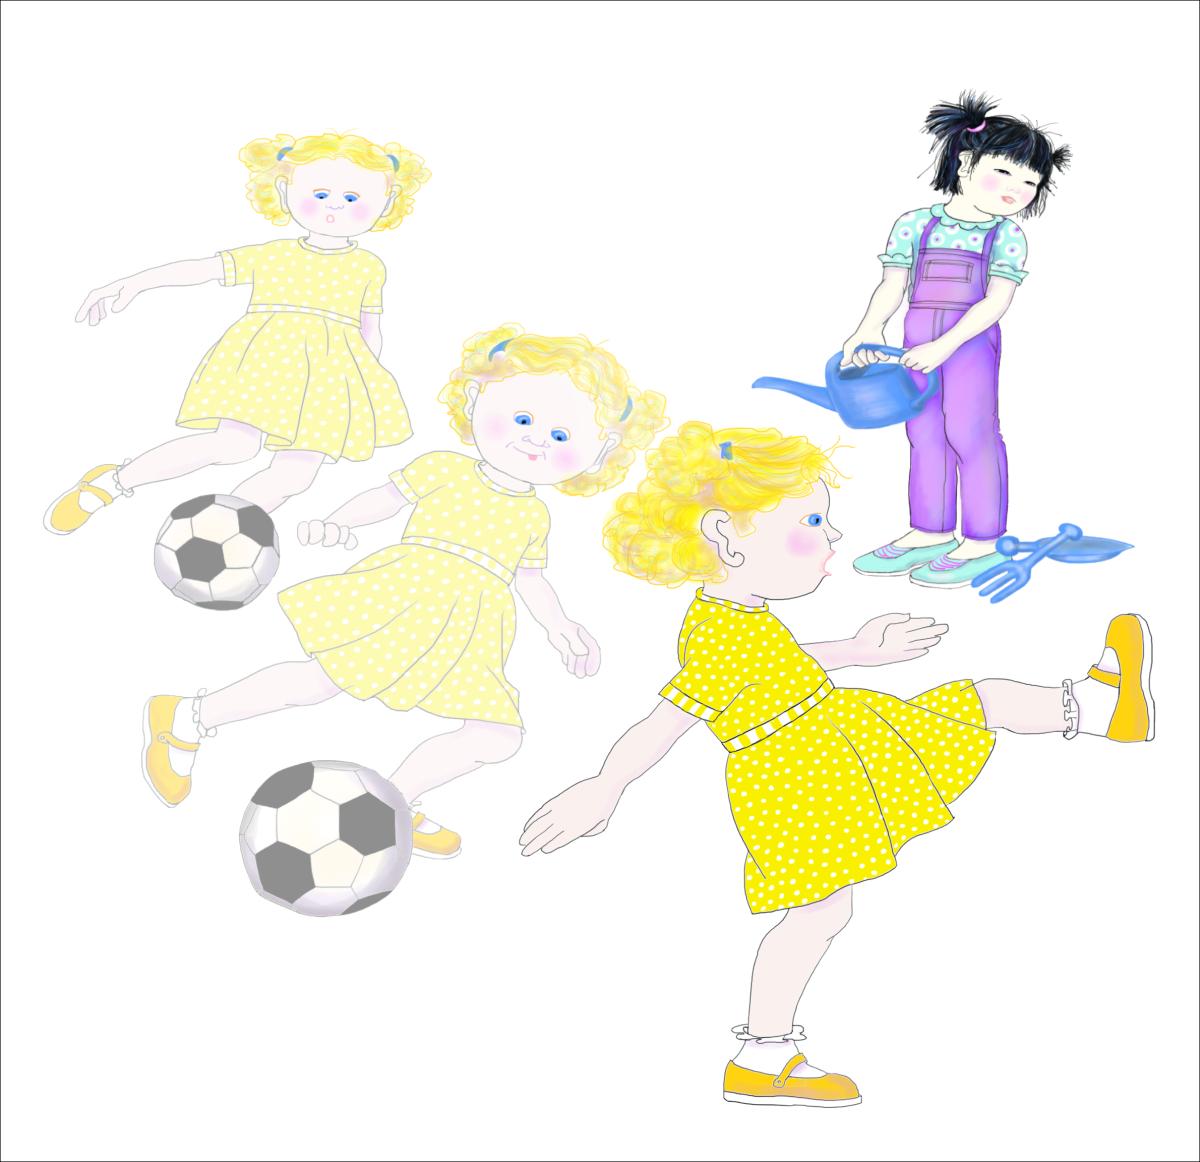 Sophie the Soccer Player, illustration by Elizabeth B Martin